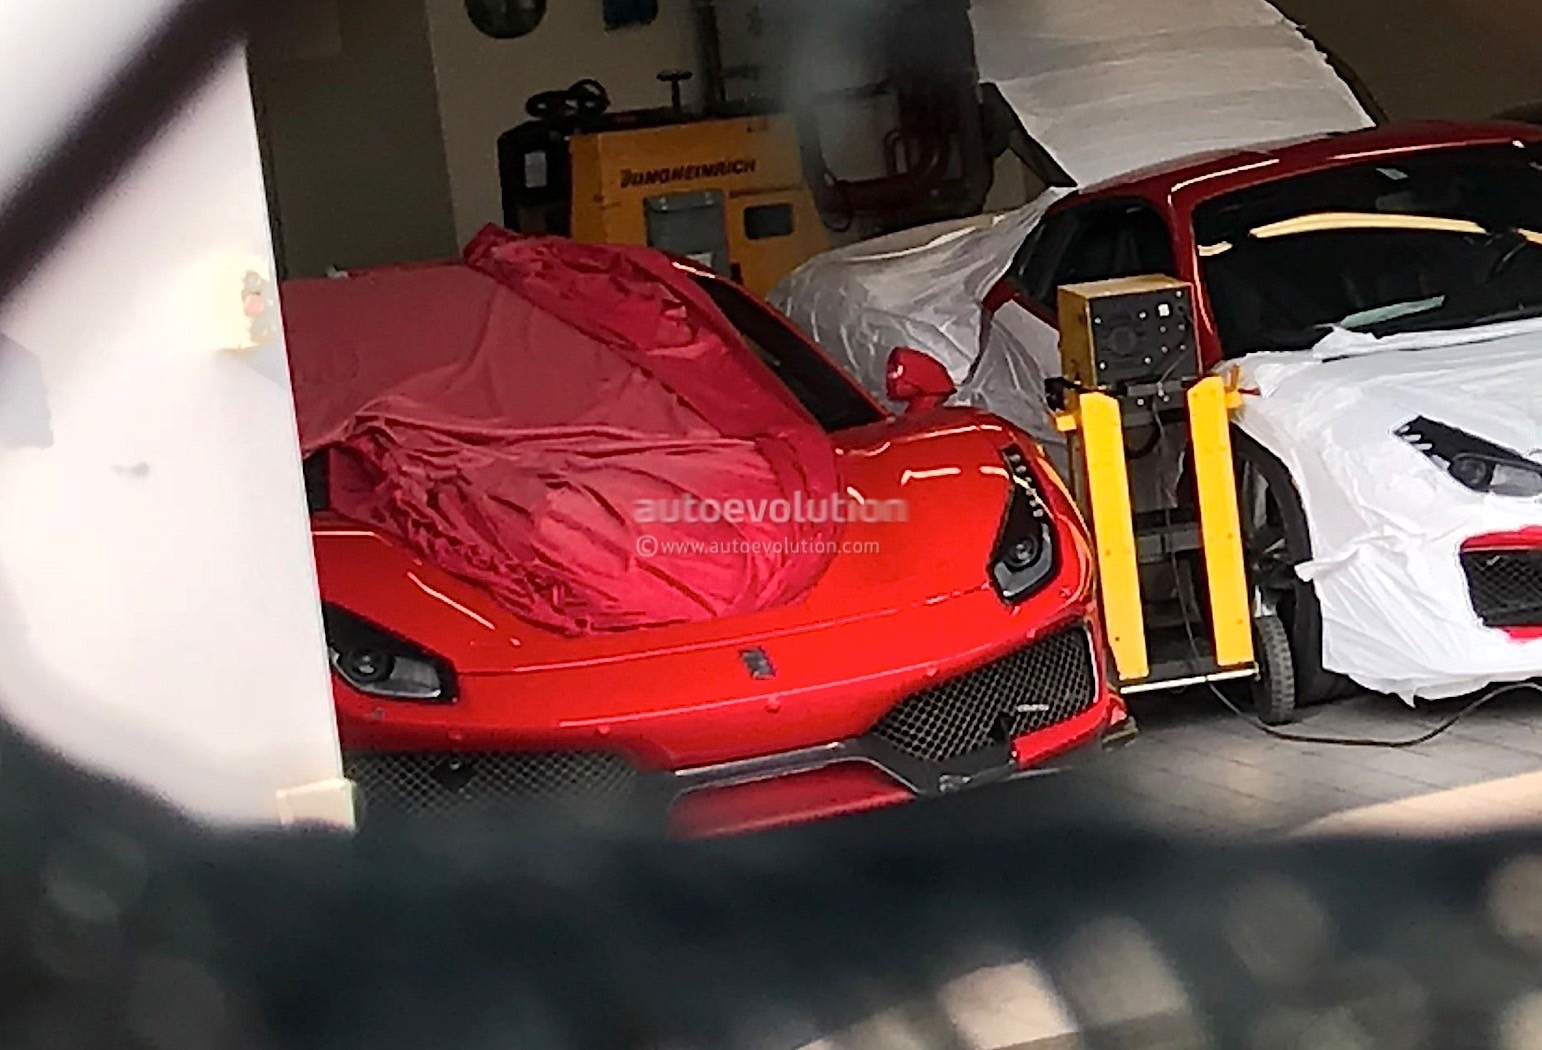 2019 Ferrari 488 GTO Spied, Uncovered Prototype Reveals ...